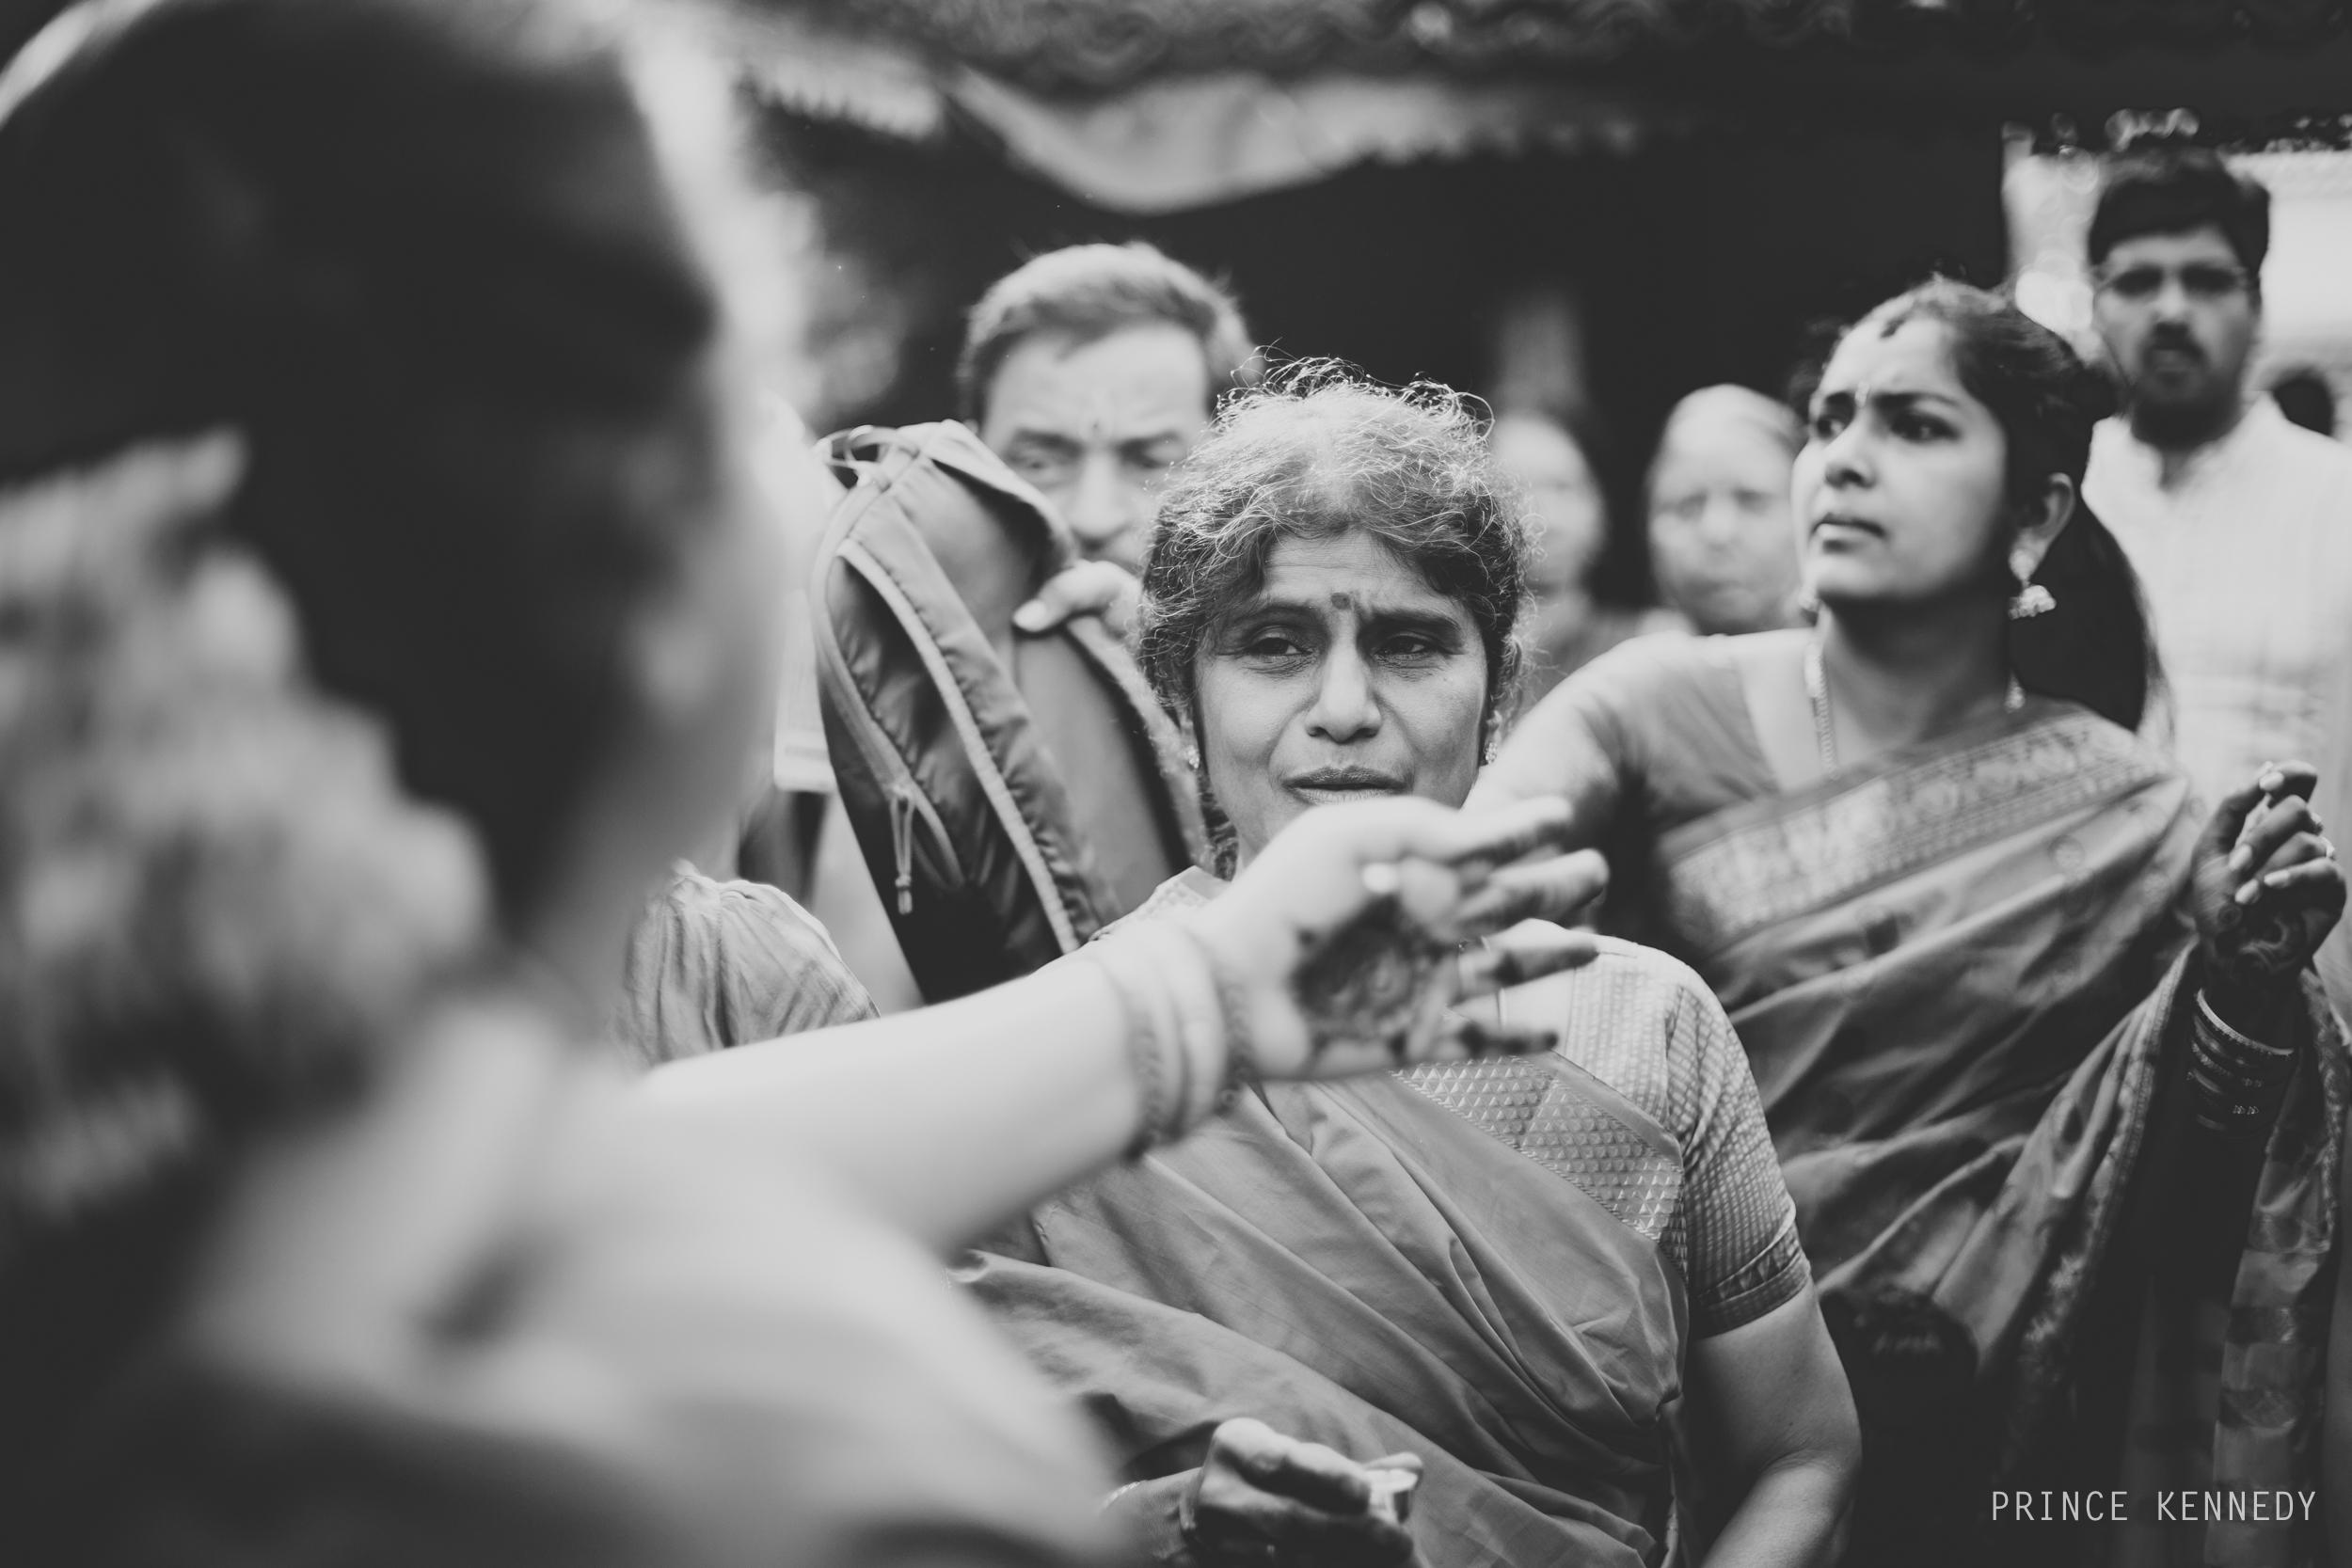 Athmajja-Nithesh-Engagement-Couple-Portrait-Portraiture-Wedding-Couple-Portrait-Chennai-Photographer-Candid-Photography-Destination-Best-Prince-Kennedy-Photography-113.jpg